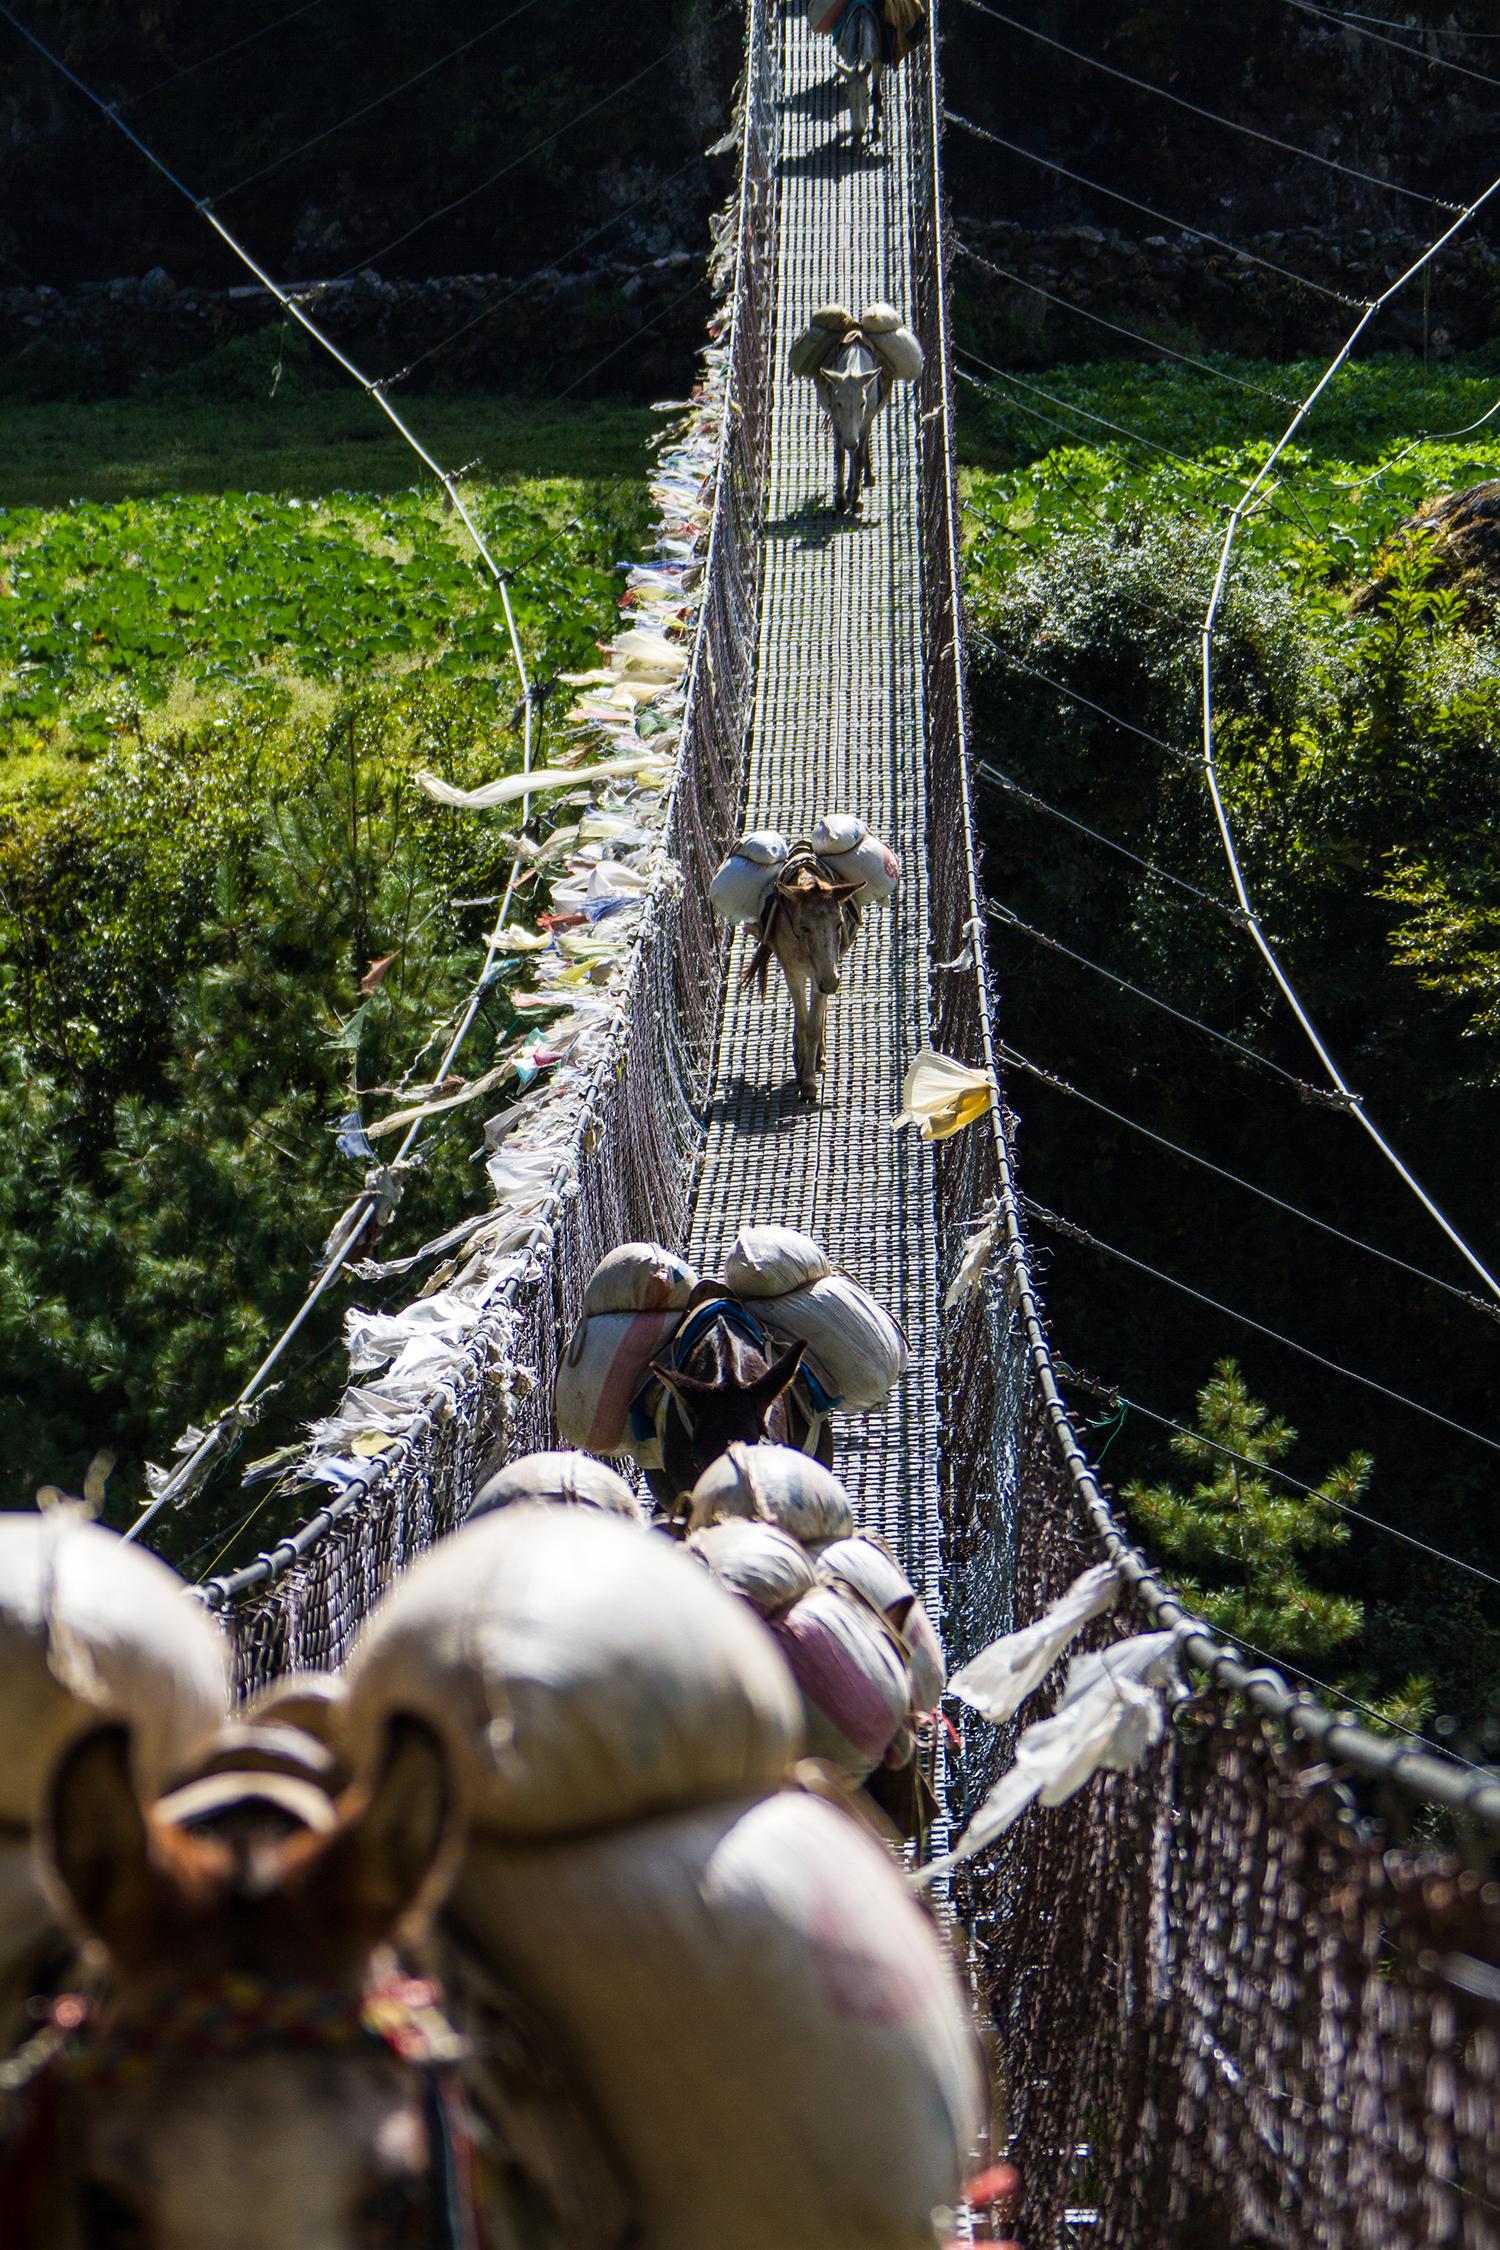 Bridge perspective breaks the leading lines rules